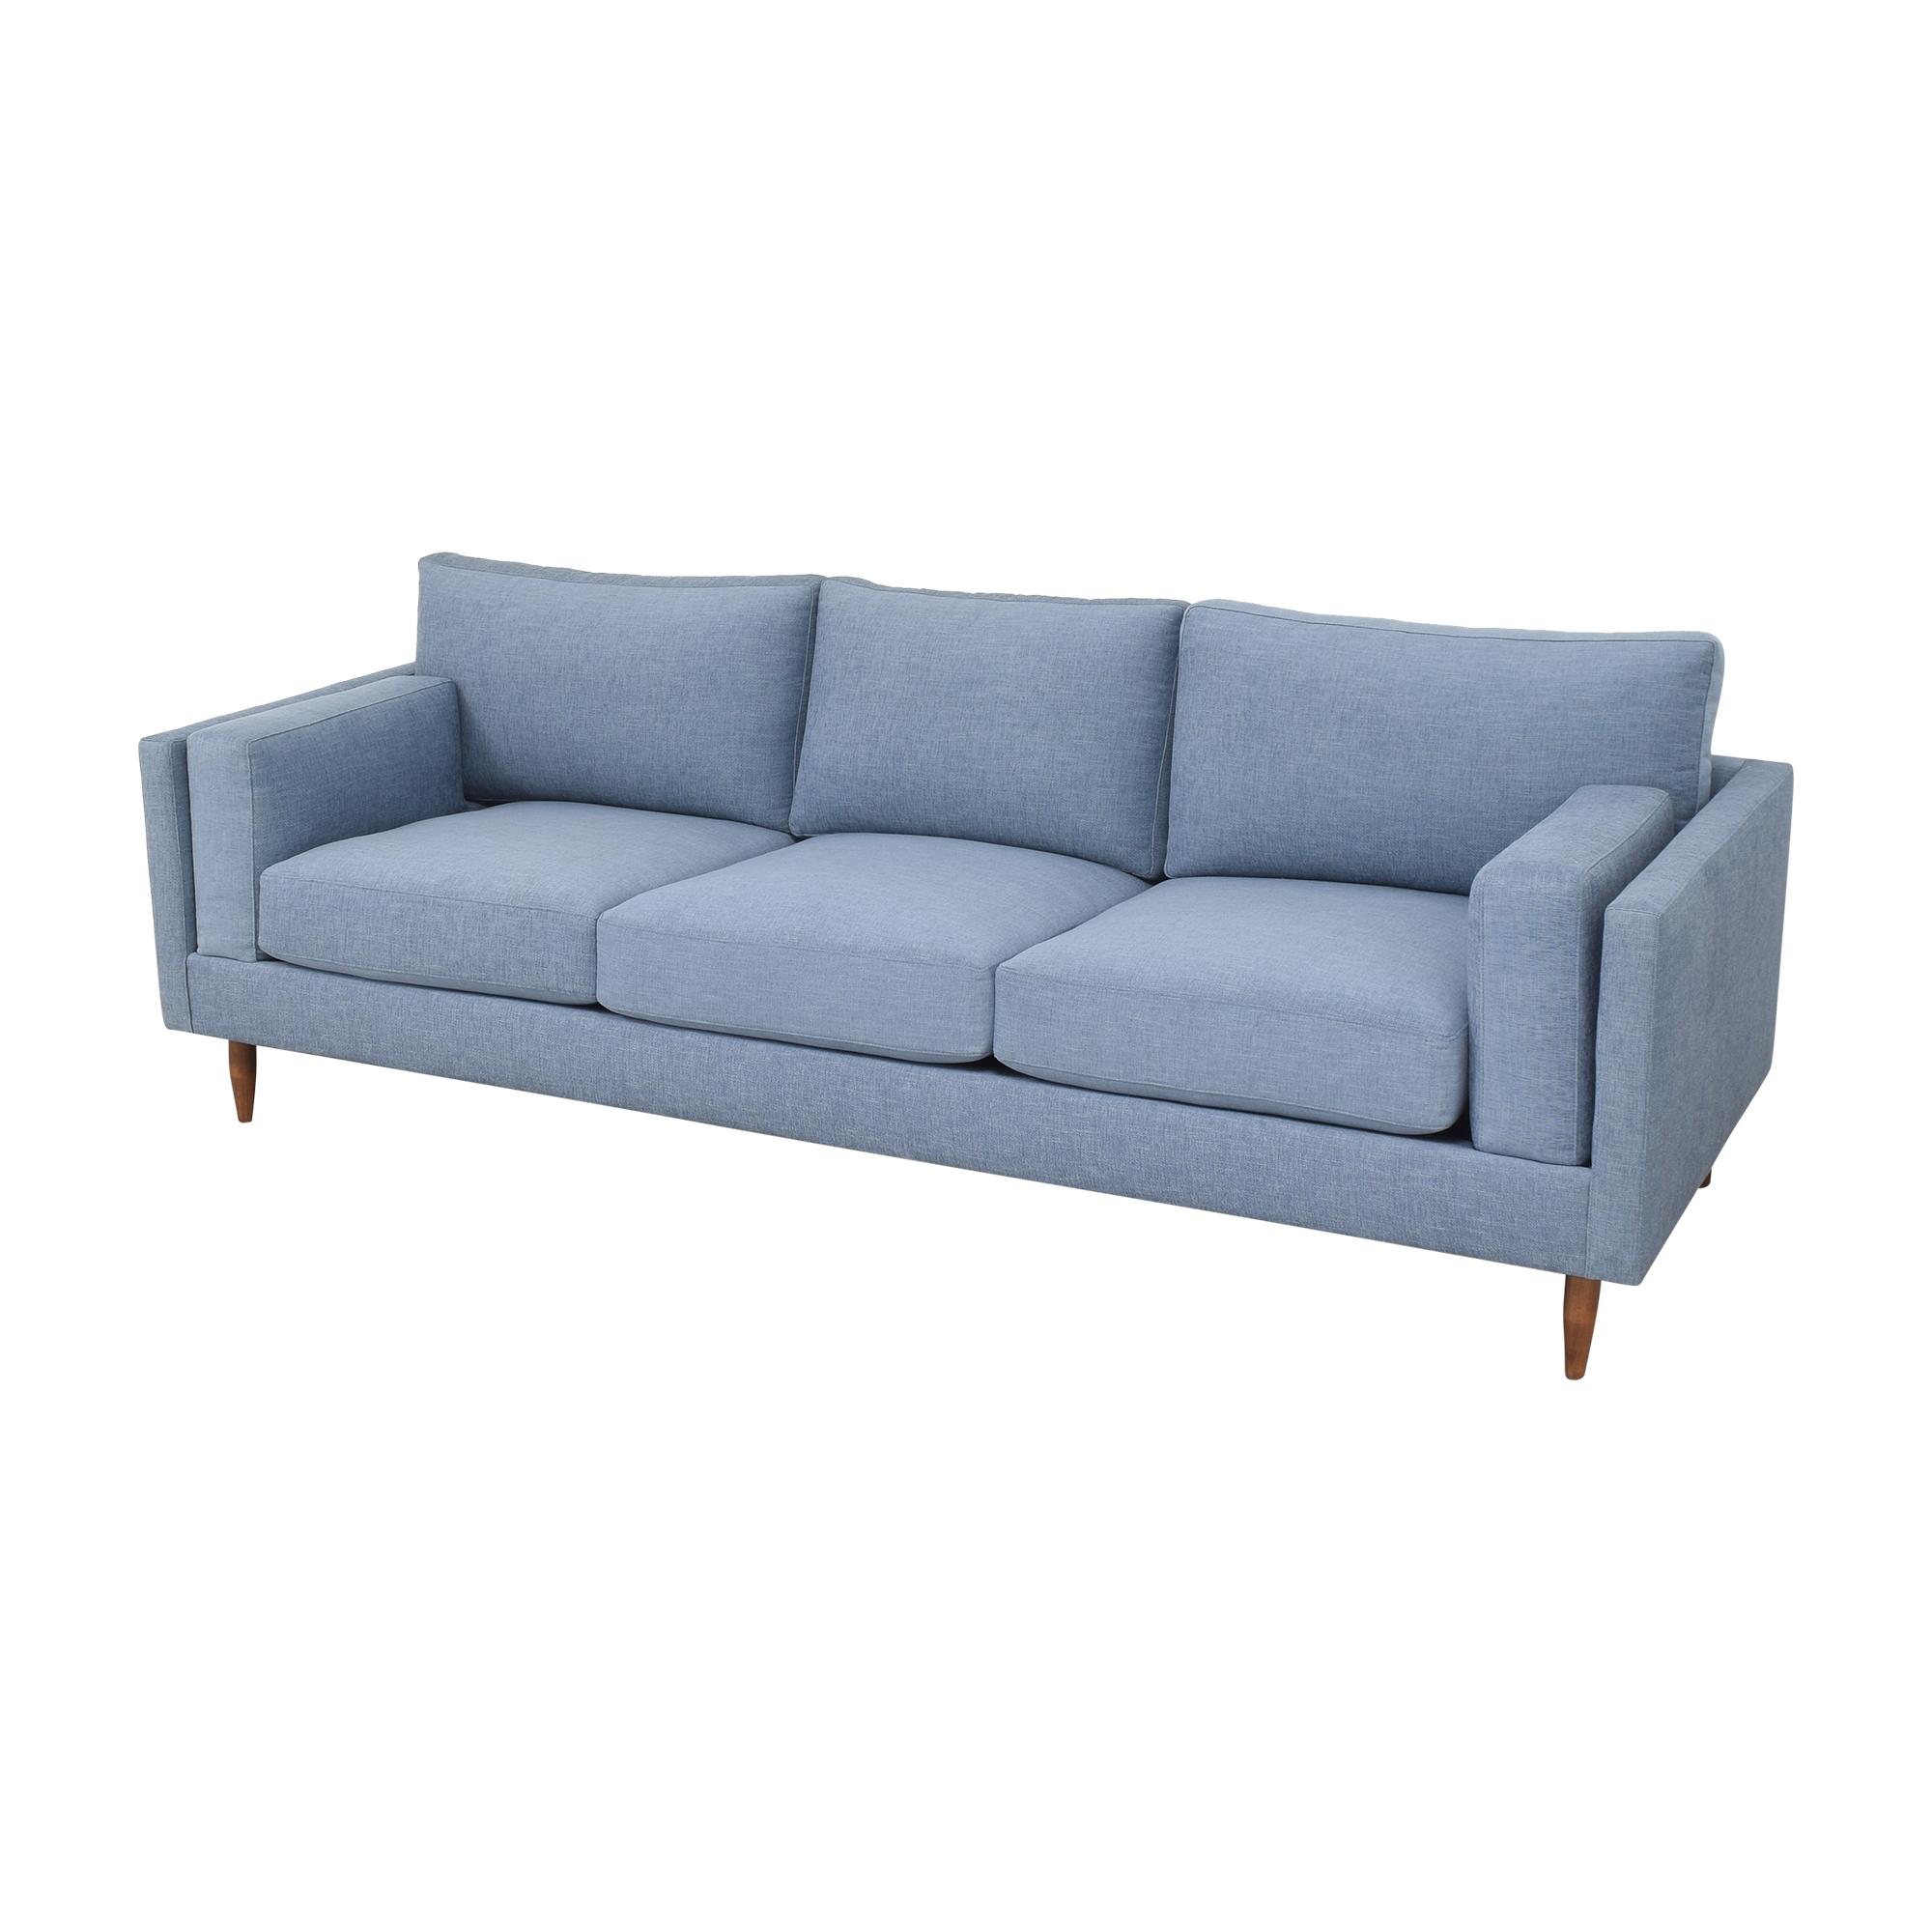 BenchMade Modern BenchMade Modern Skinny Fat Sofa with Ottoman ma